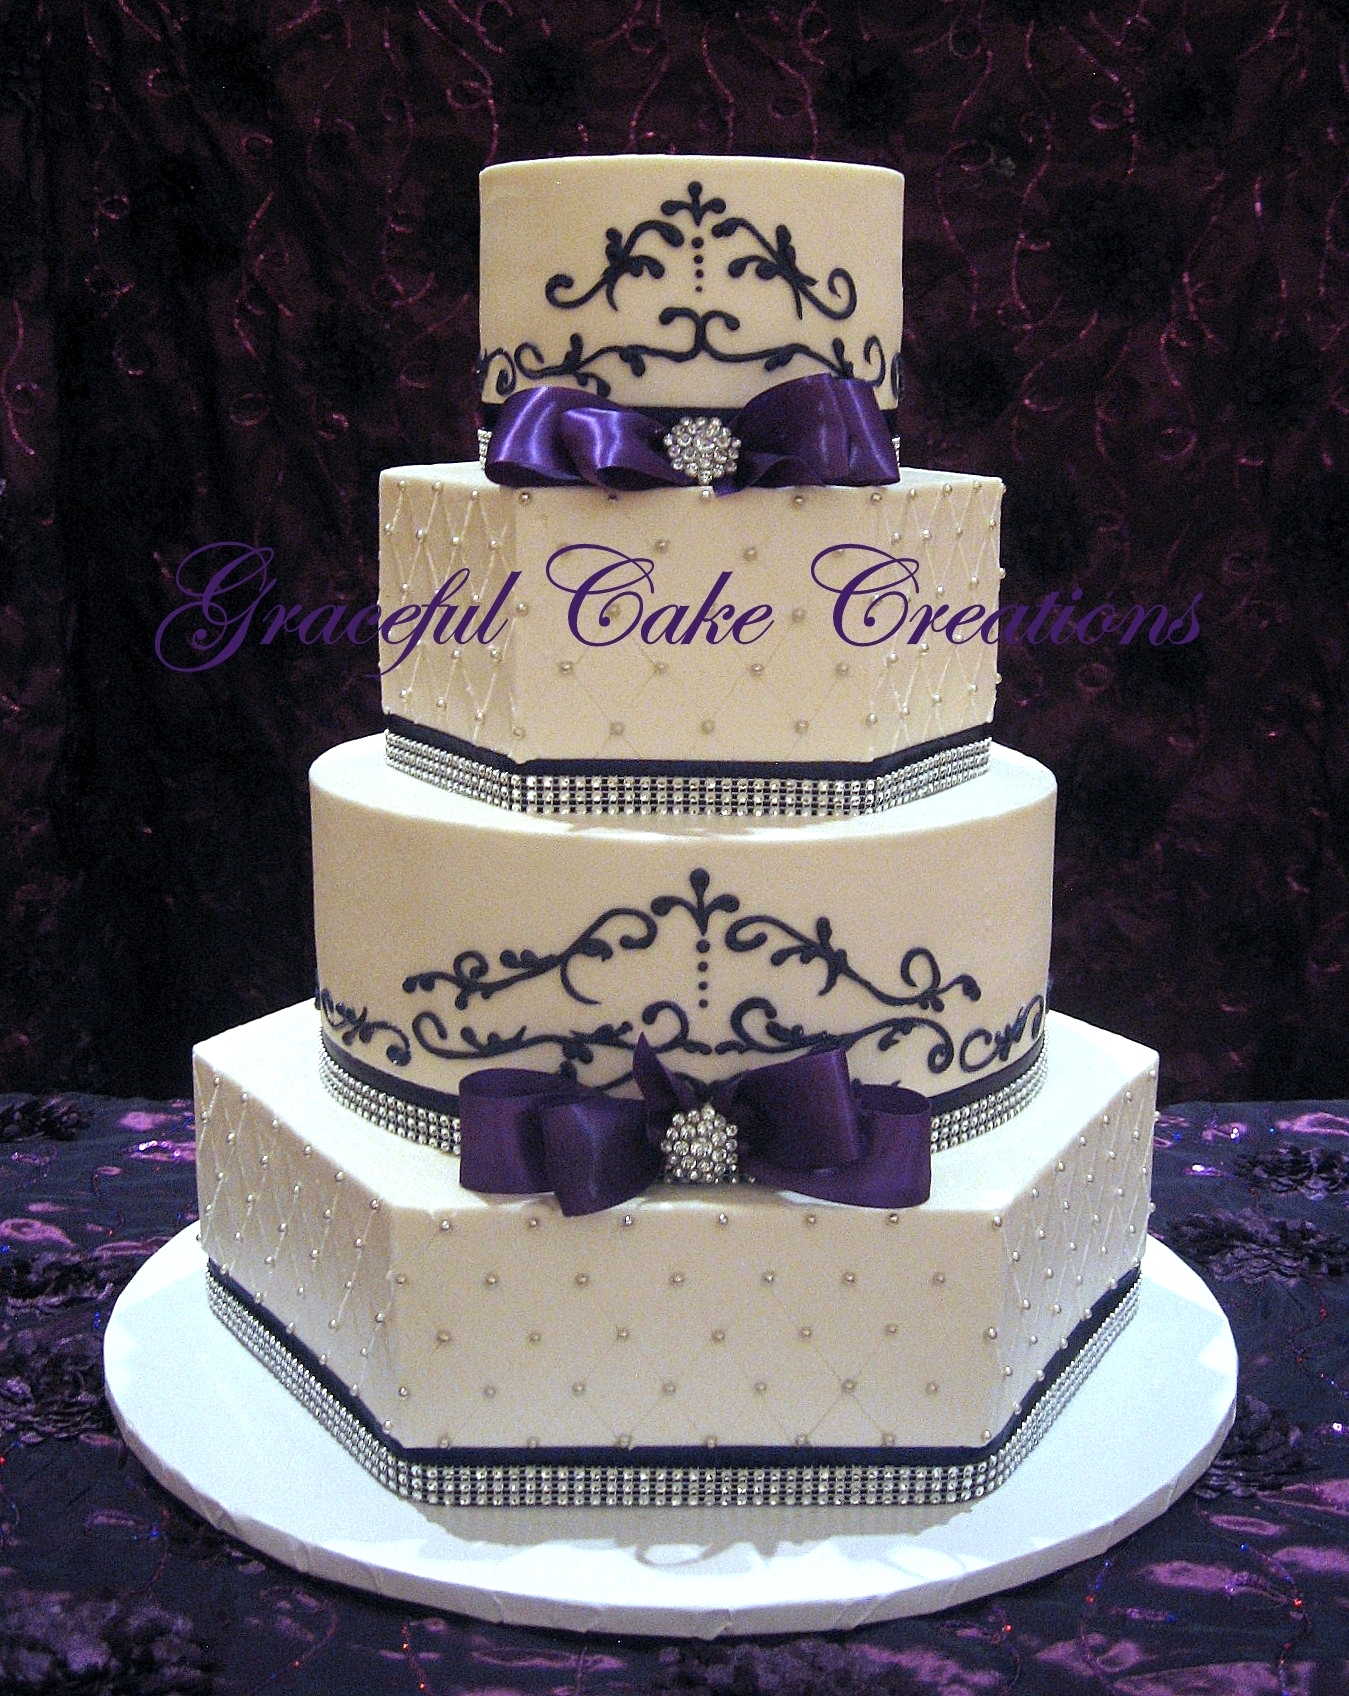 Elegant White and Purple Wedding Cake